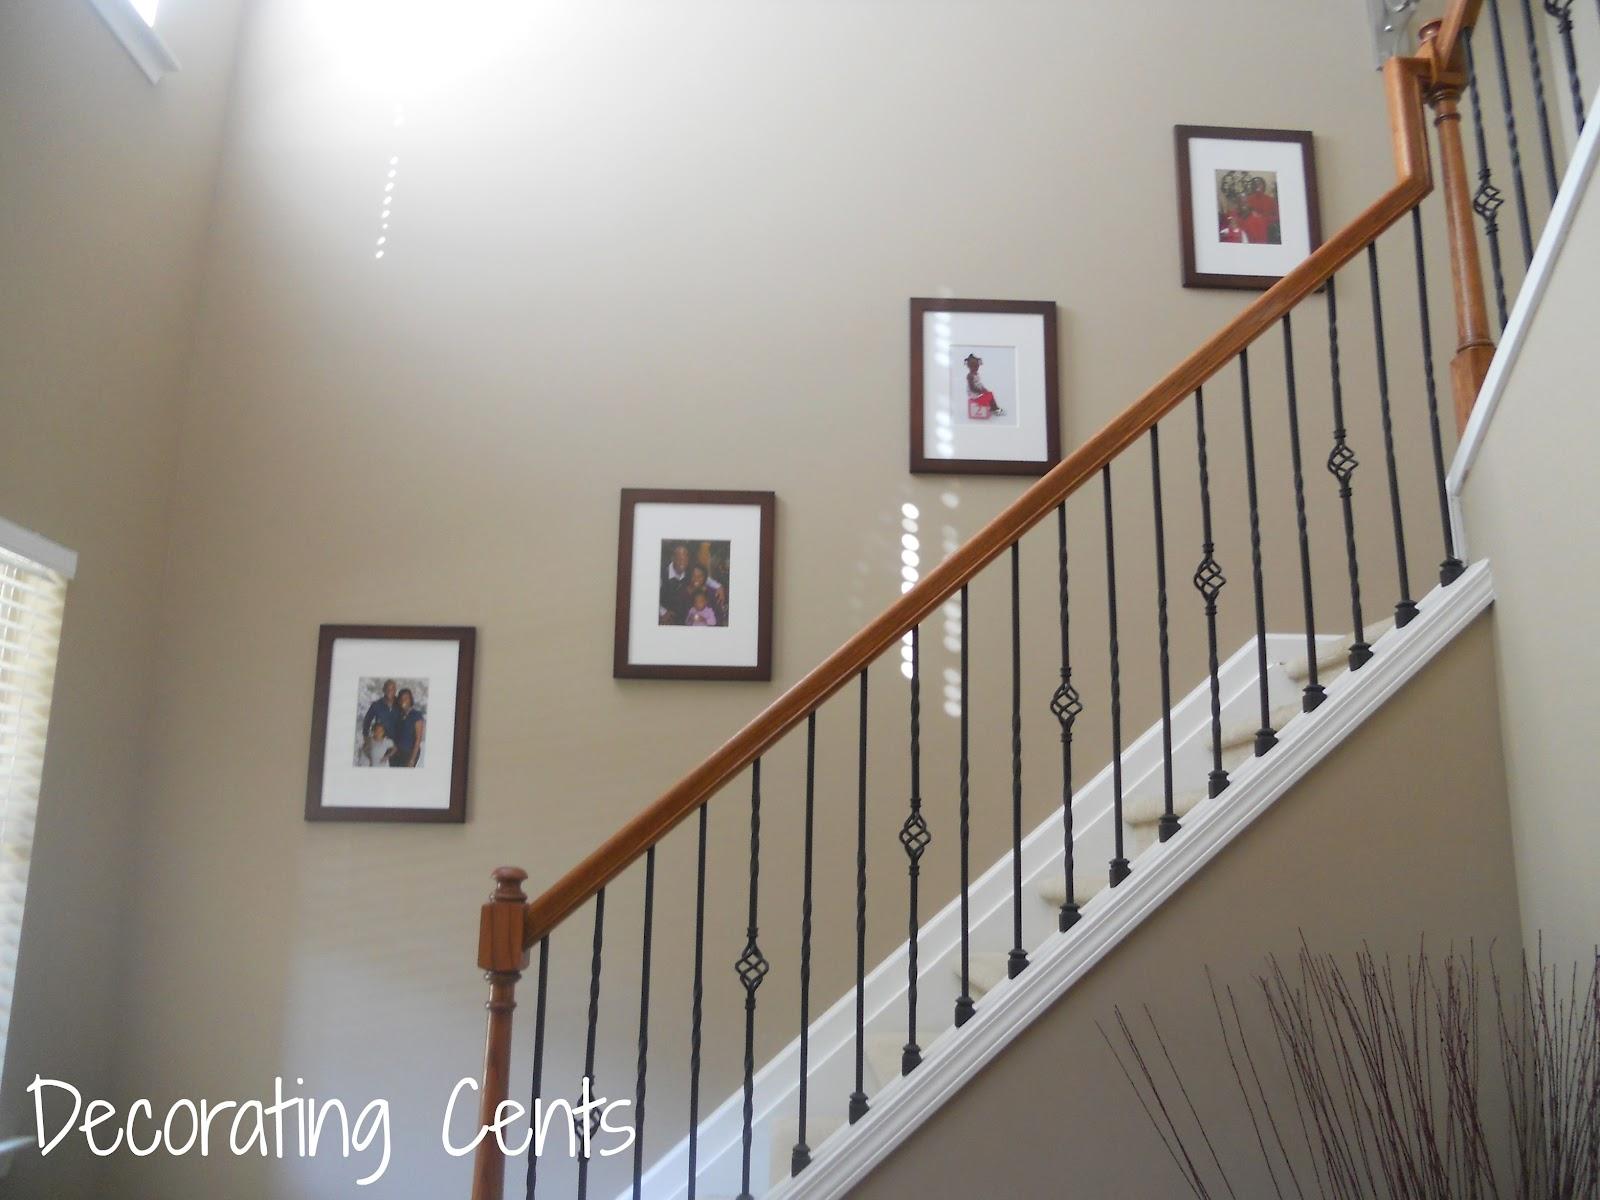 Chic Decorating Staircase Wall Ideas Stair Frame Decor 1600x1200 Wallpaper Teahub Io